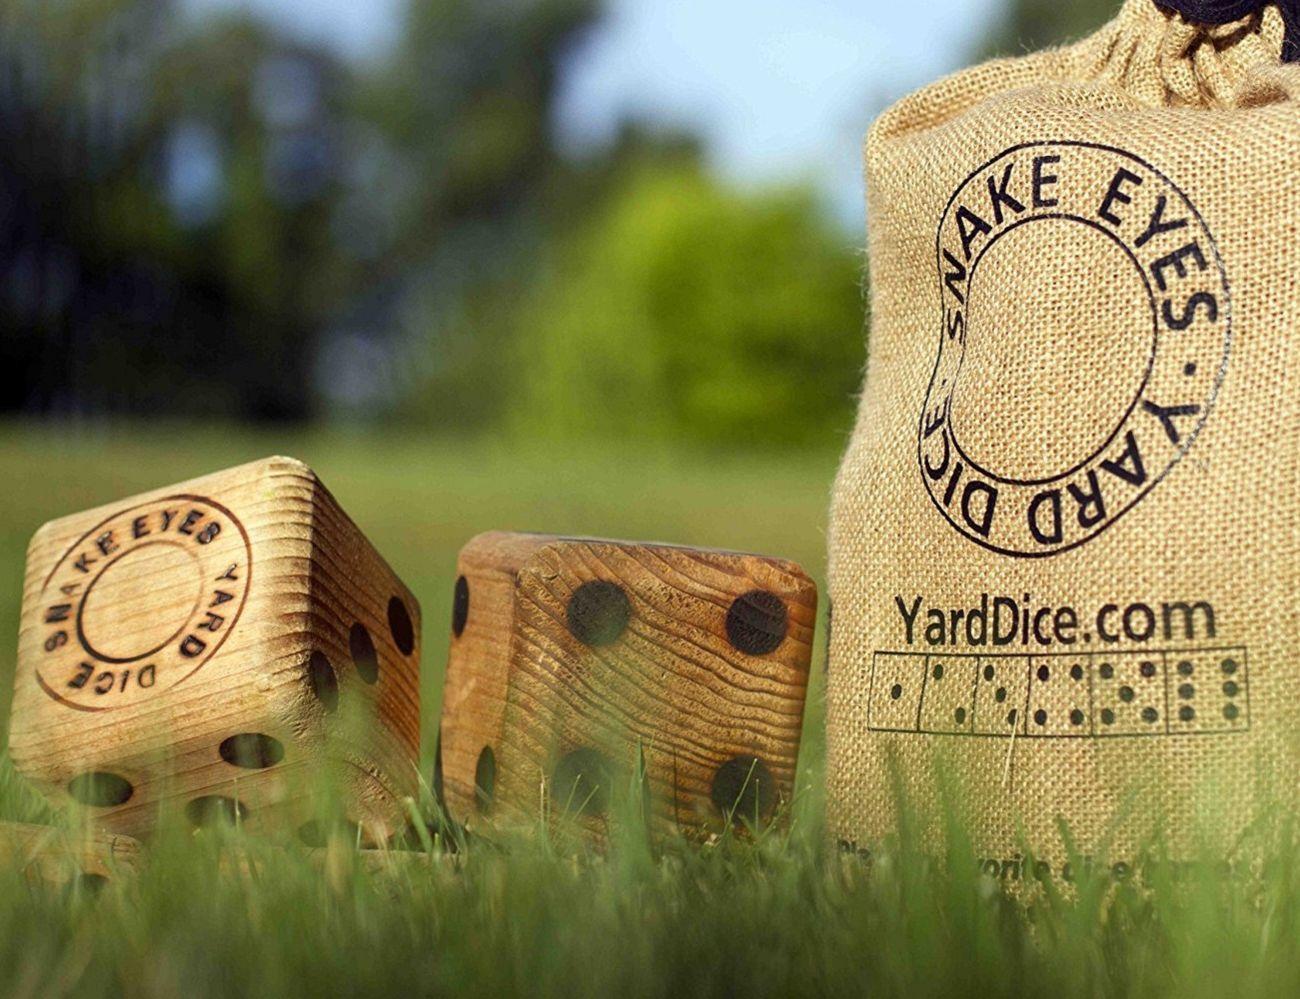 Giant Wood Yard Dice